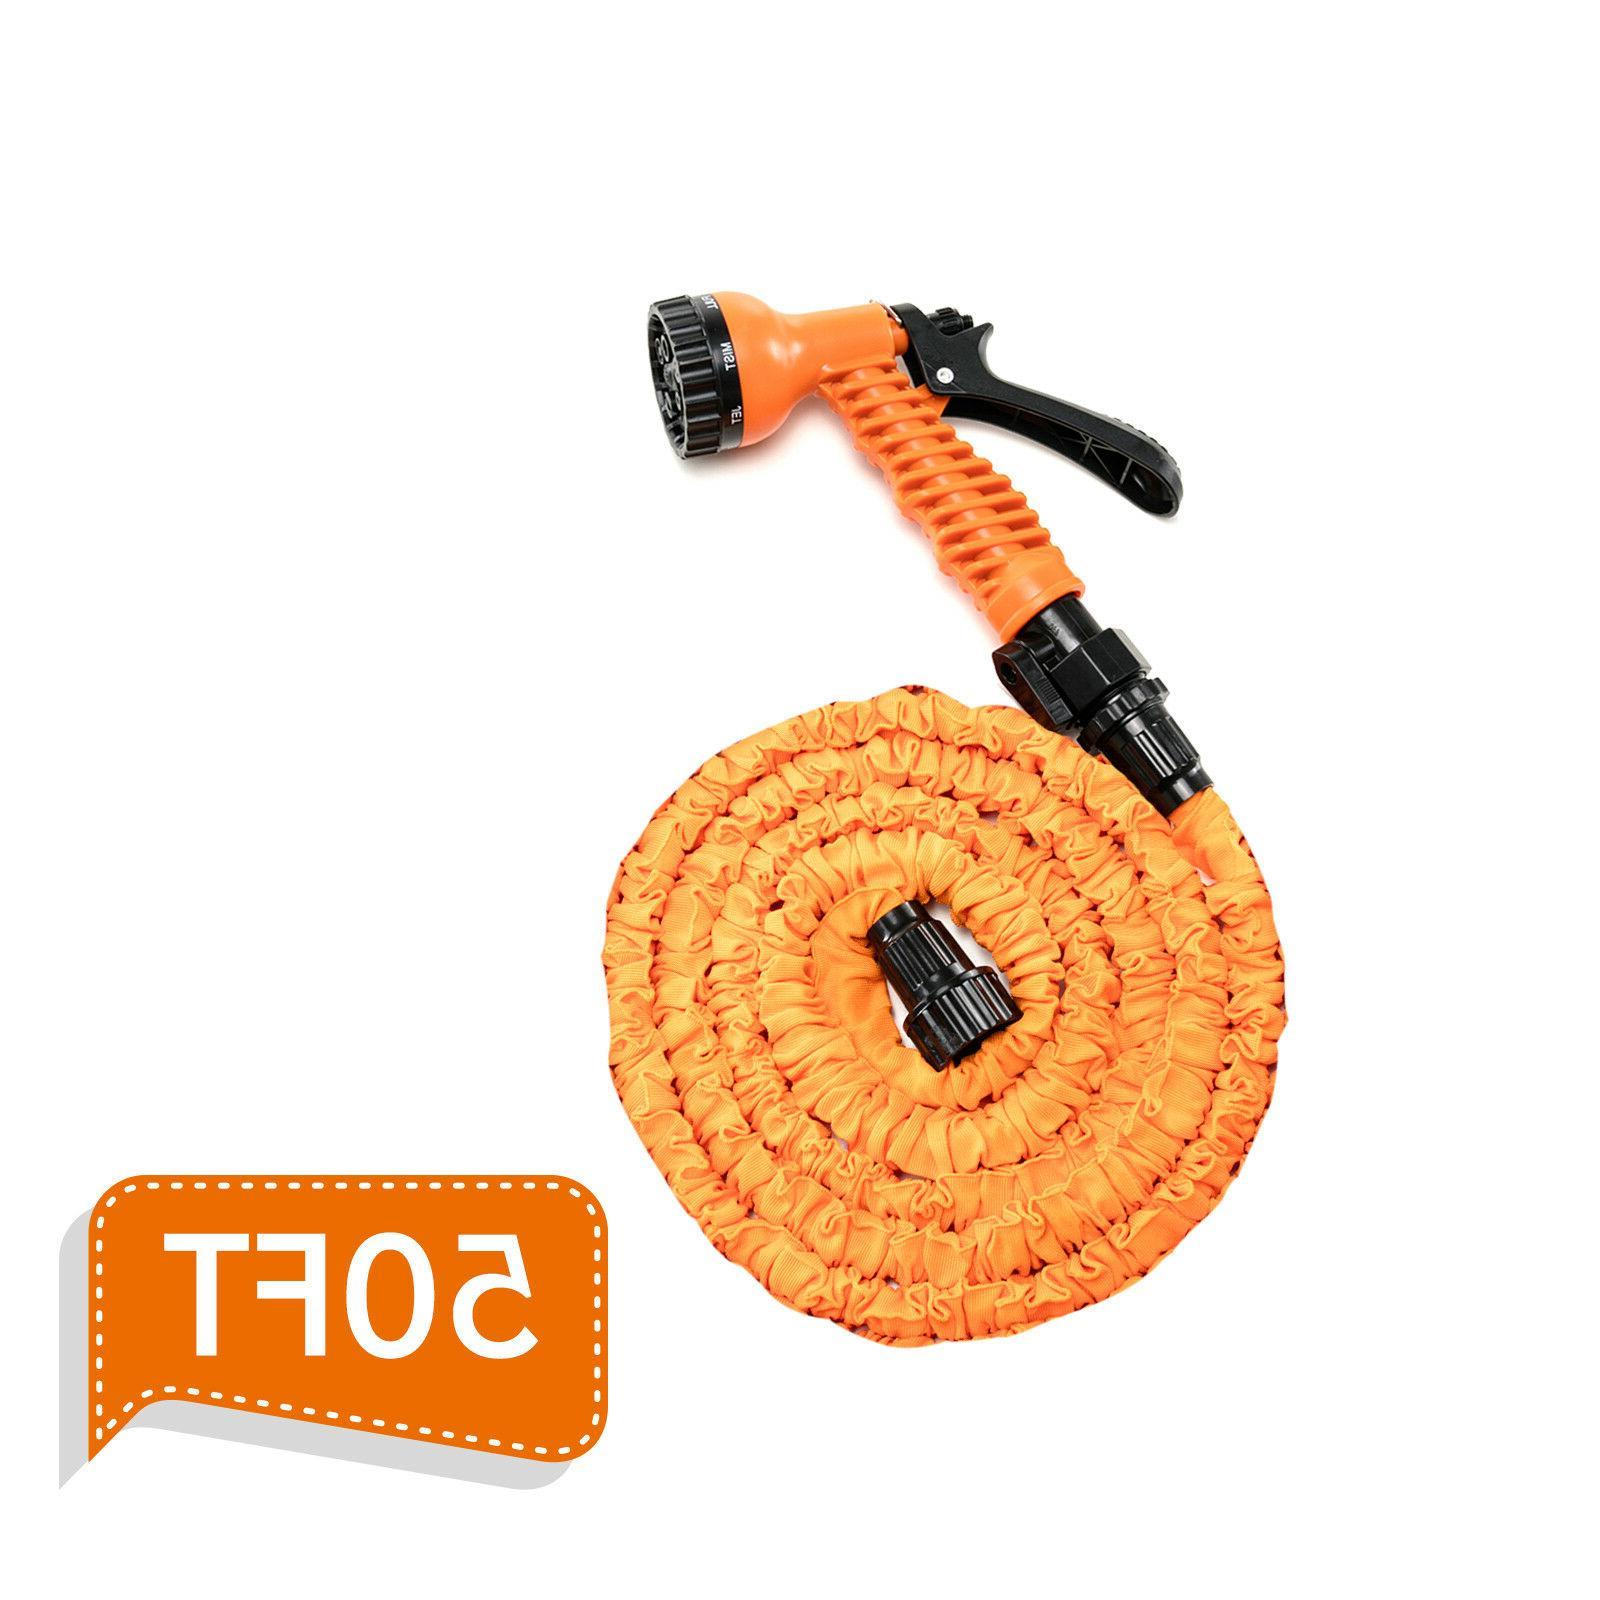 Deluxe 50 75 FT Nozzle Flexible